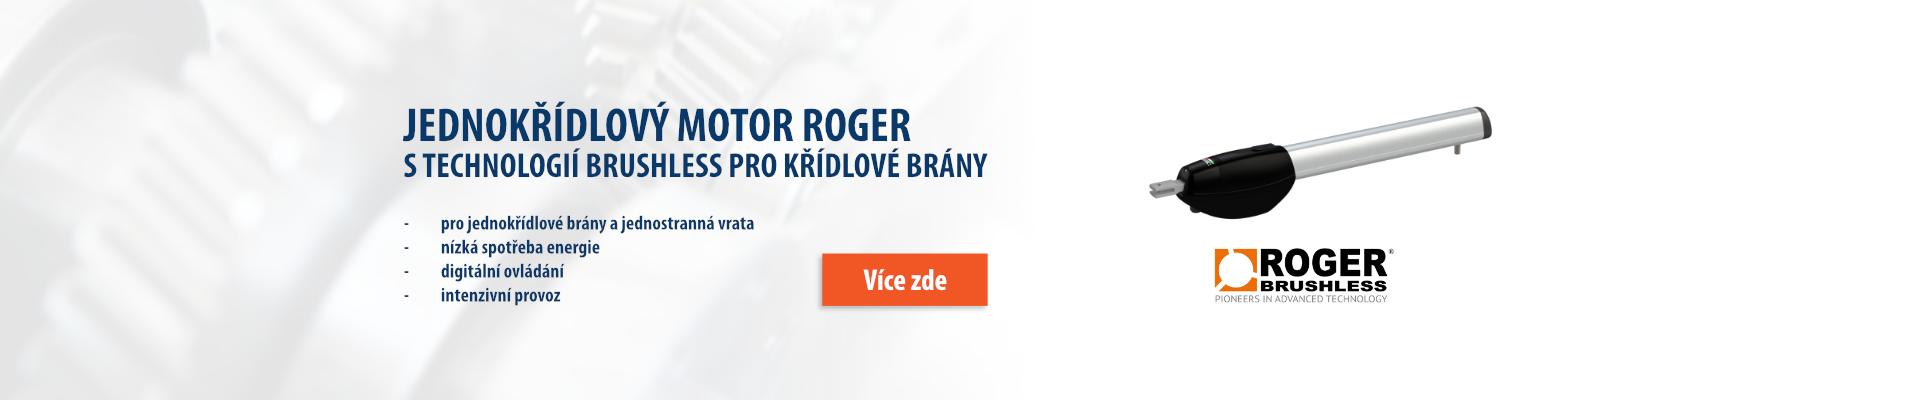 Banner - banner_jednokridlovy_motor_roger-1561526397.png